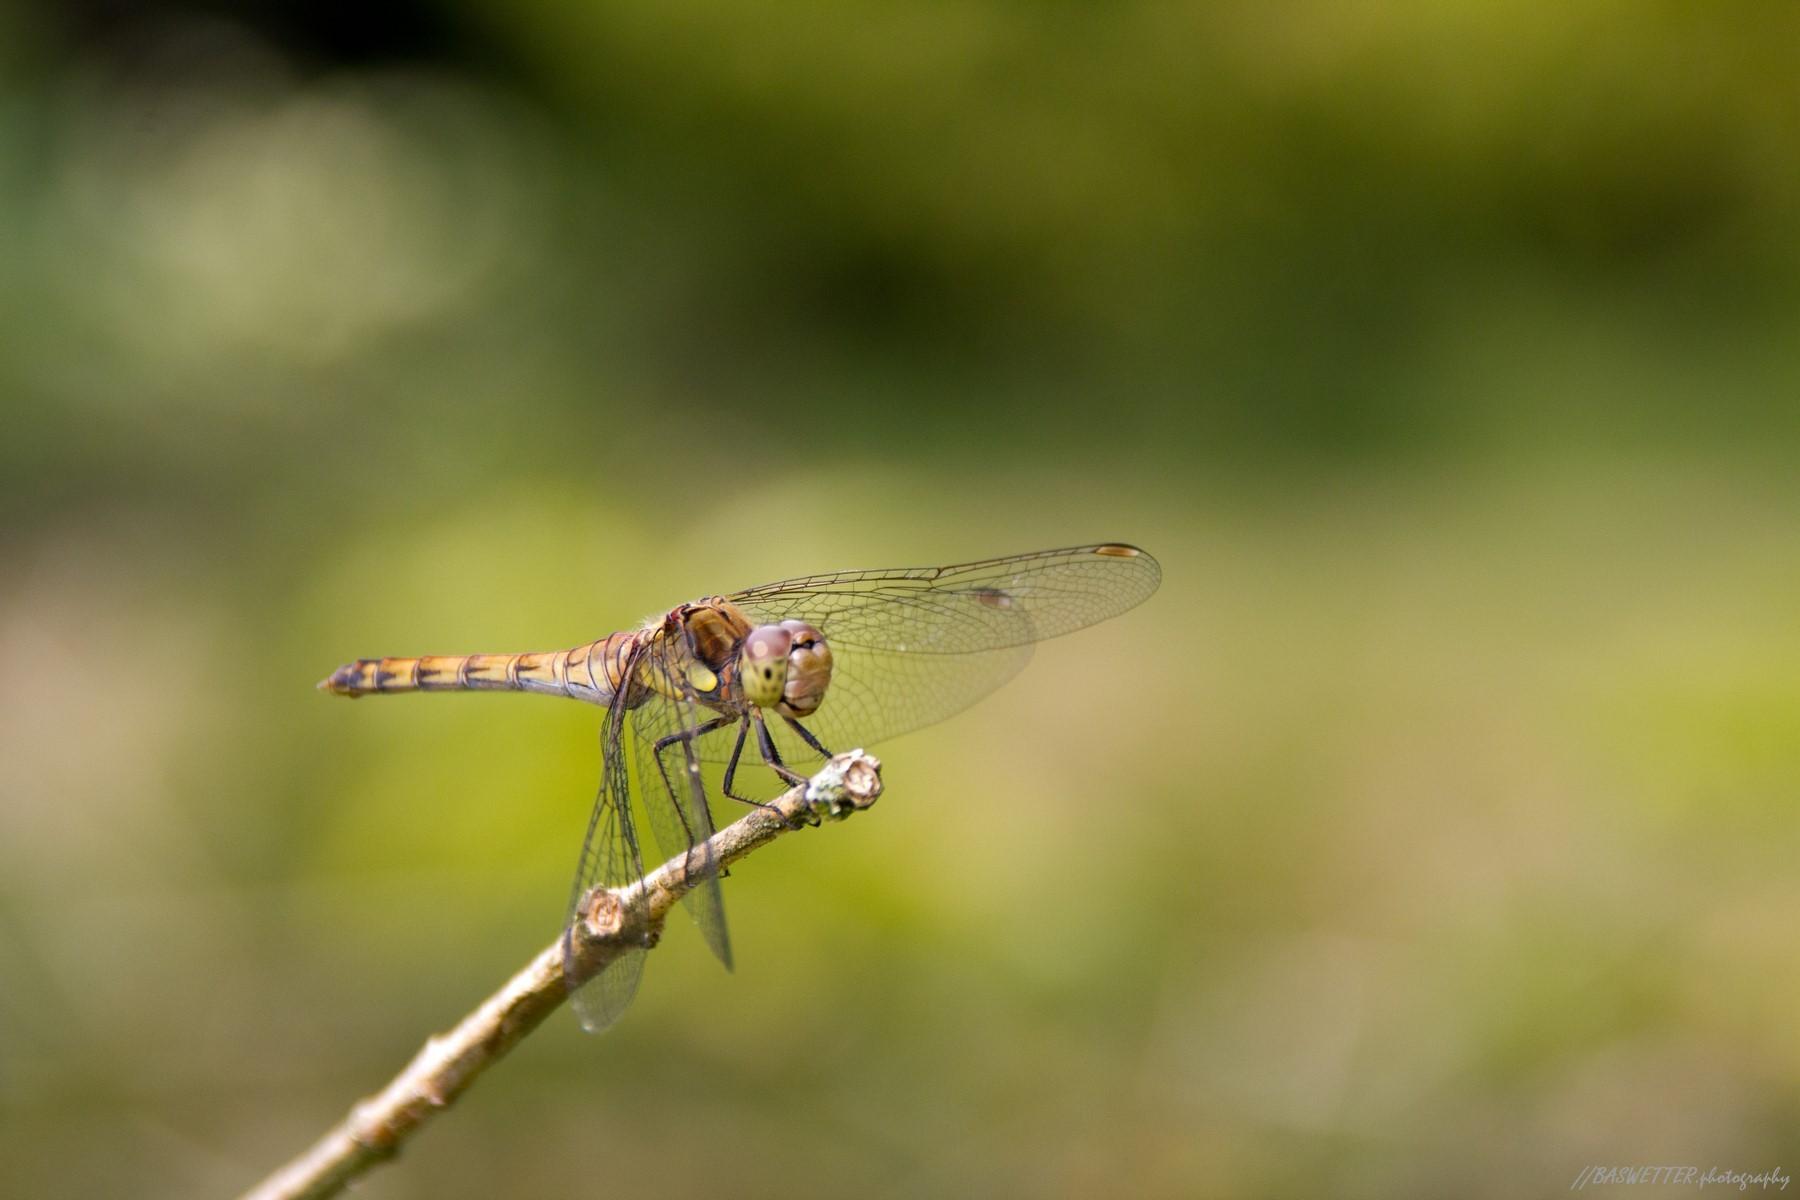 Libelle op een takje